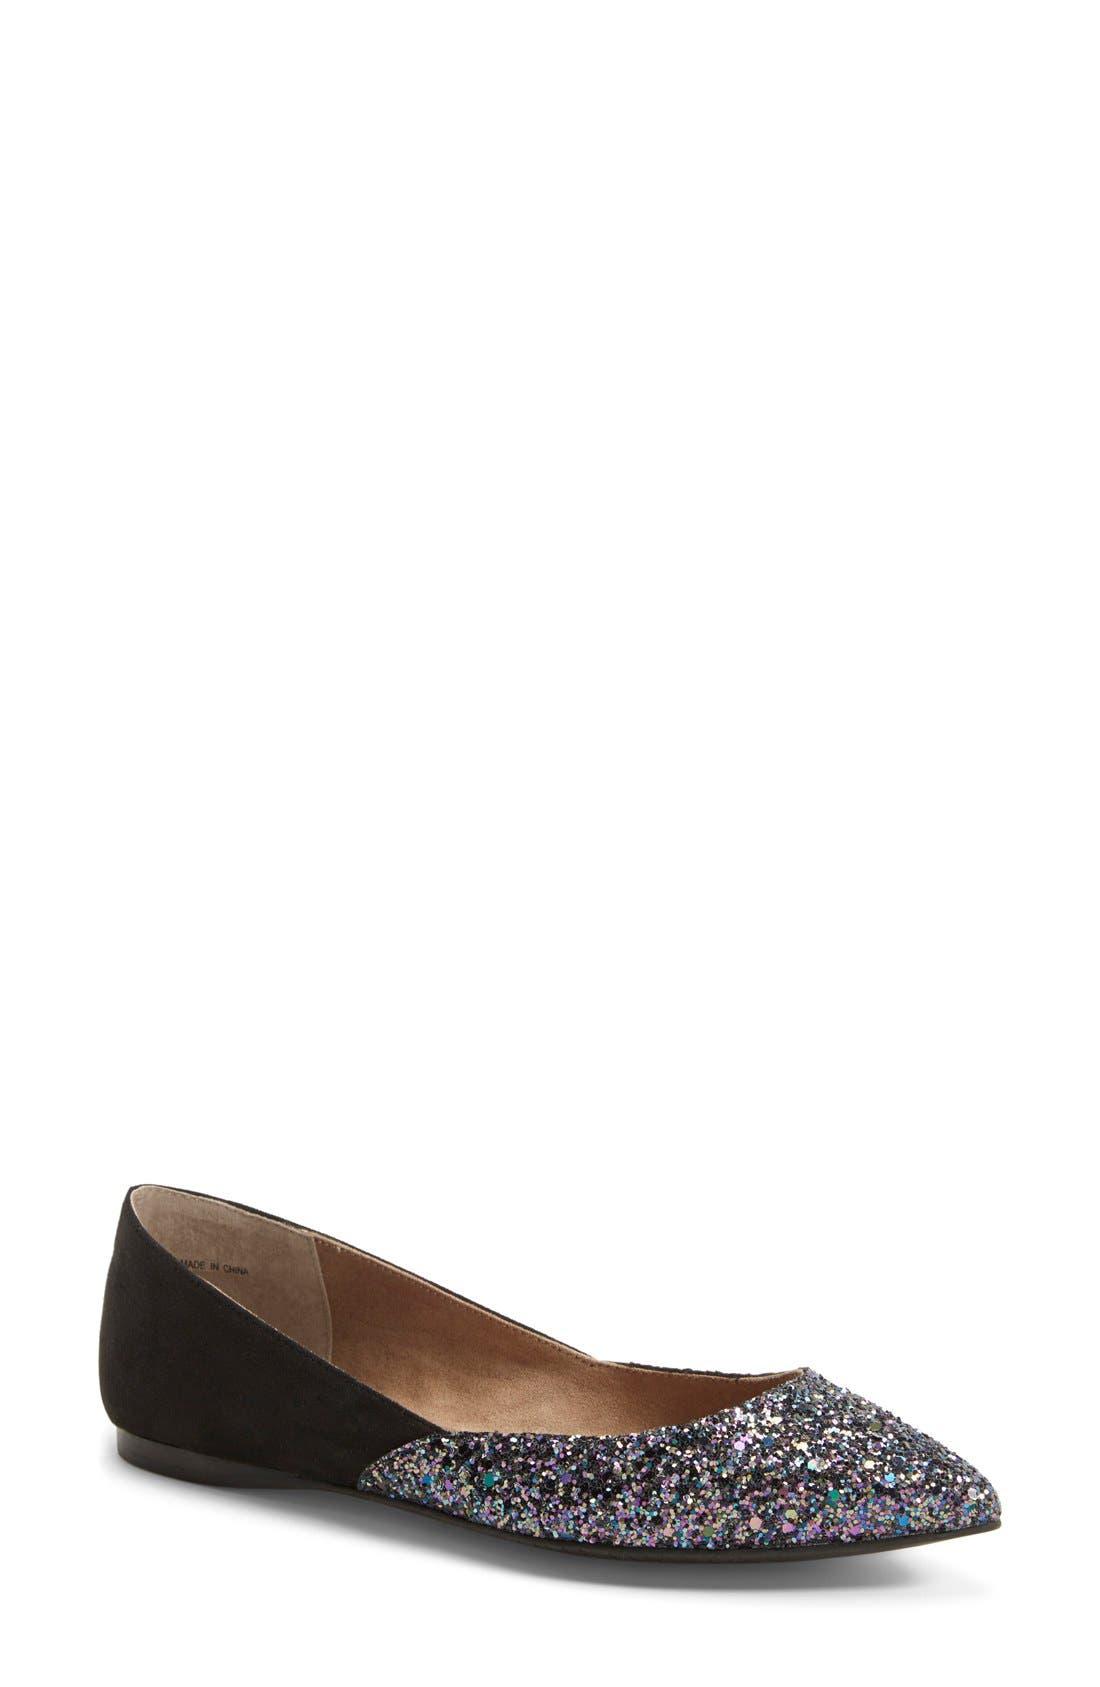 'Doubletime' Pointy Toe Flat,                         Main,                         color, Black Glitter